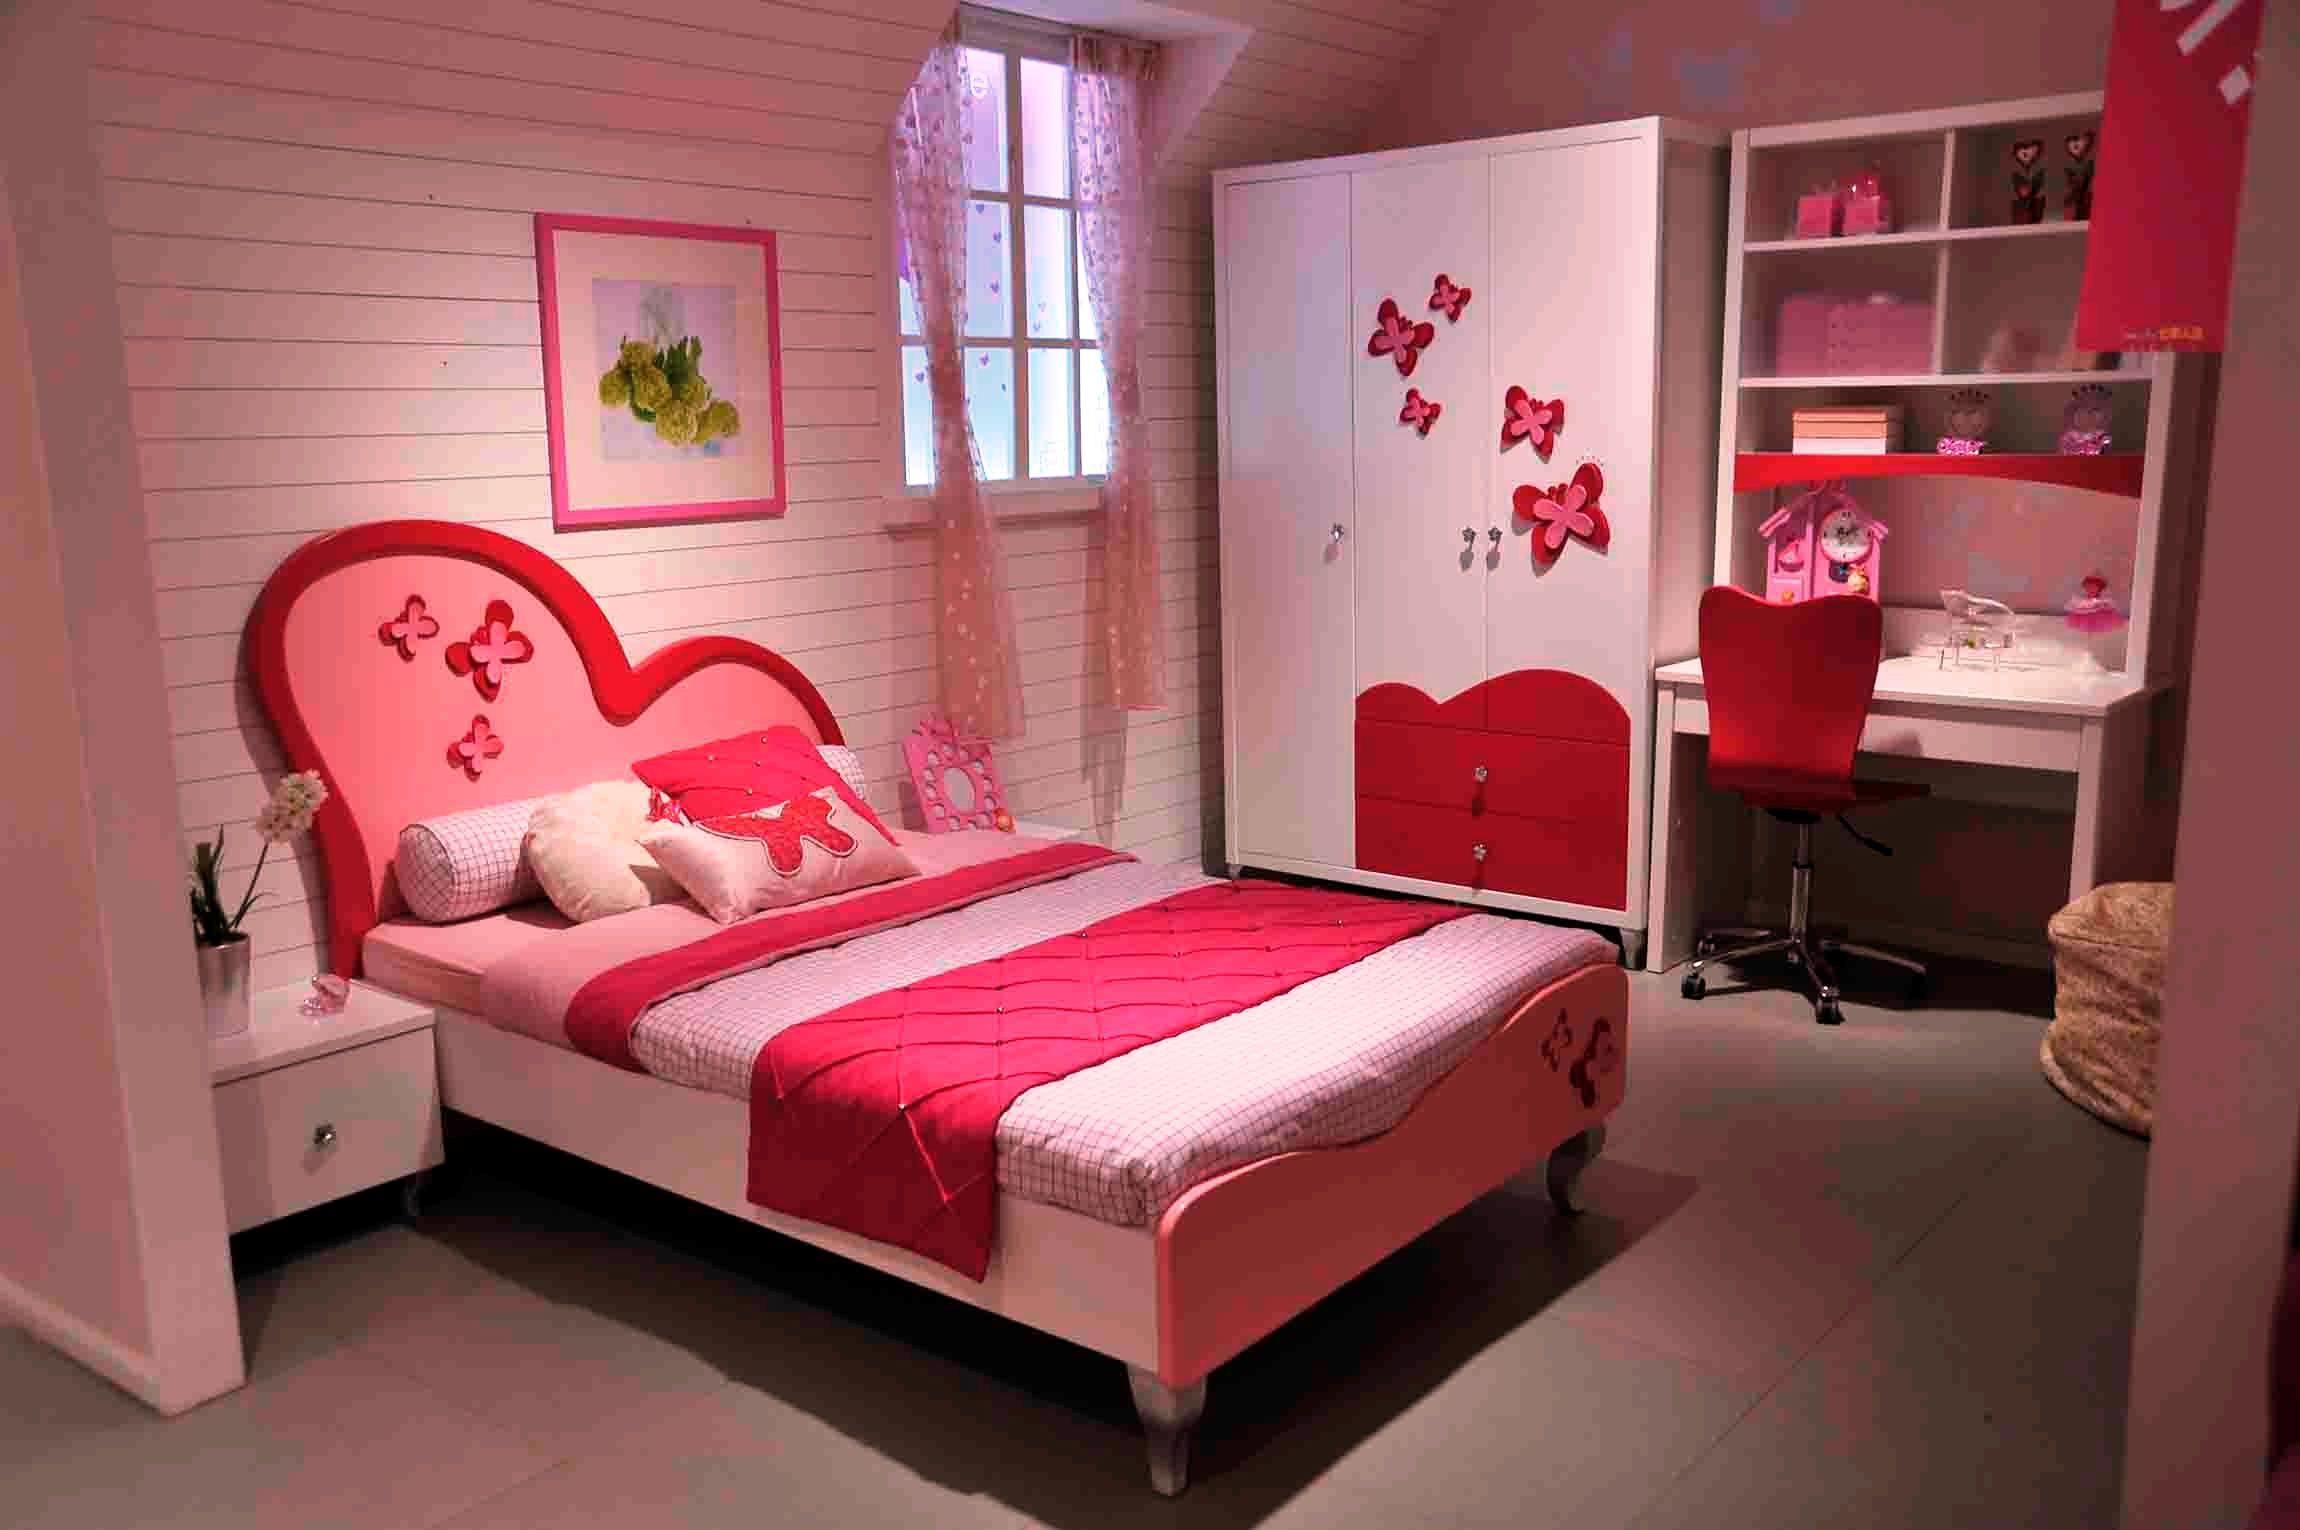 صور غرف نوم بنات اجمل غرفة نوم بنات 2020 قلوب فتيات